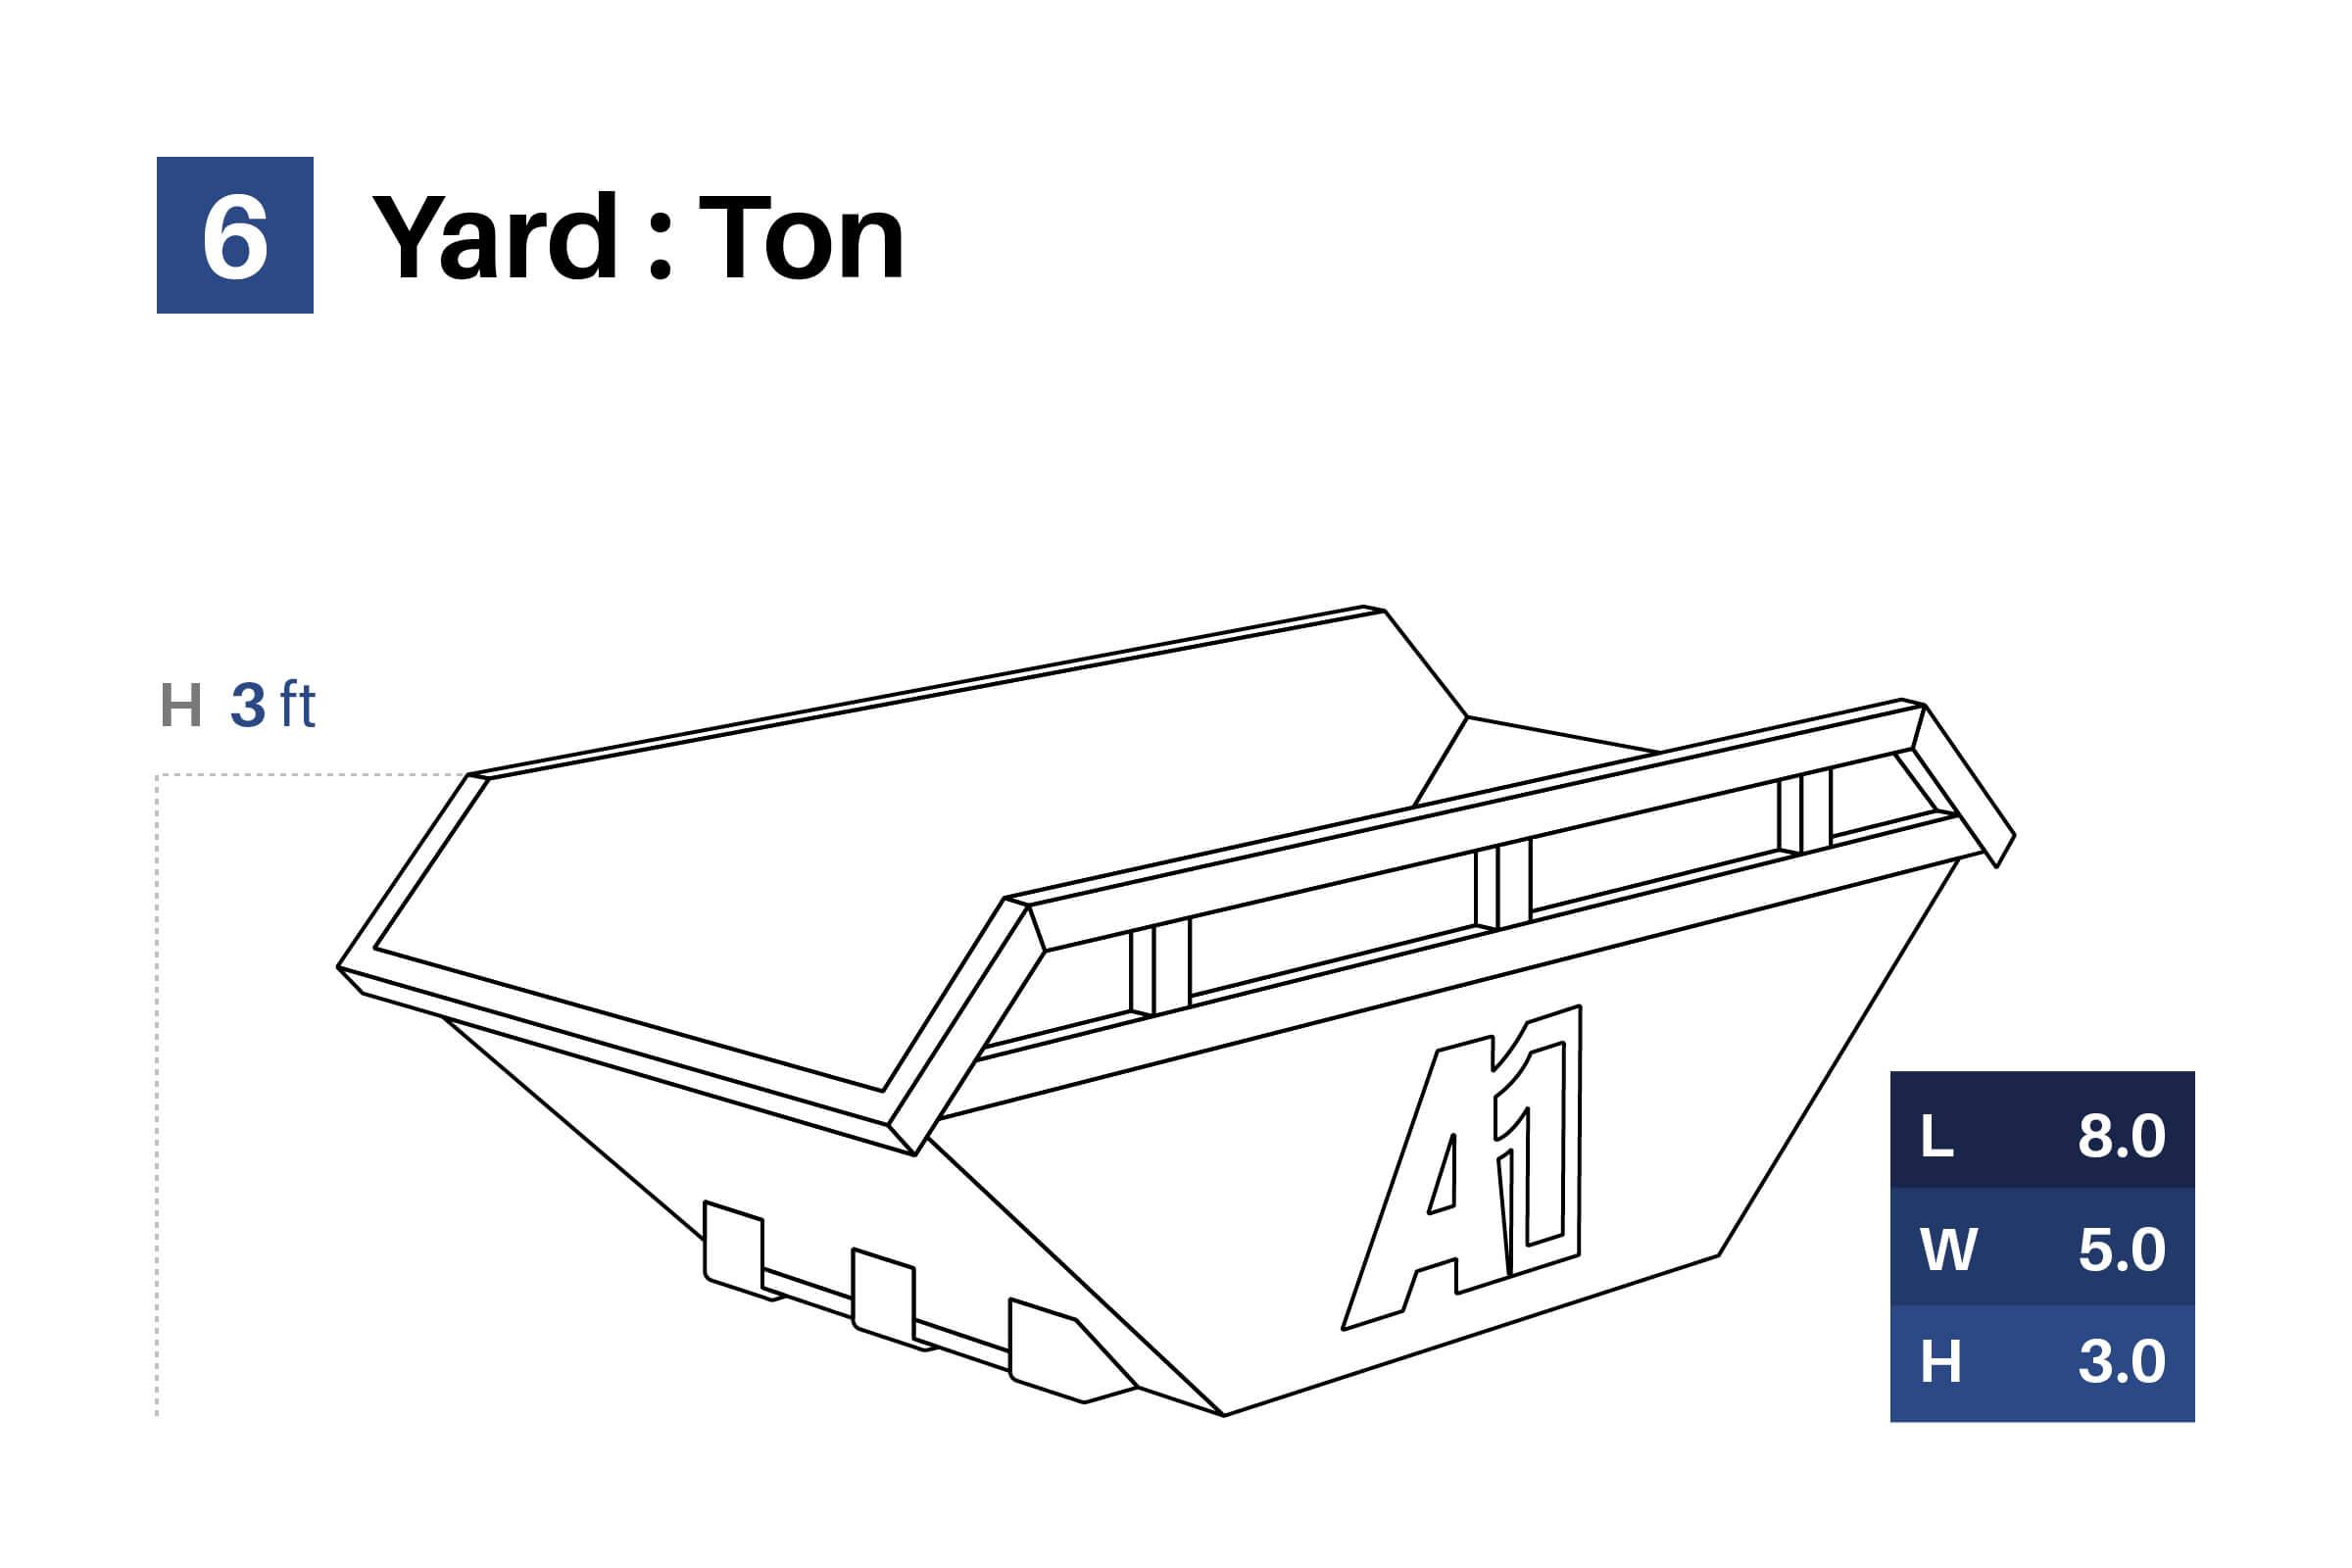 a1skip-hire-6yard